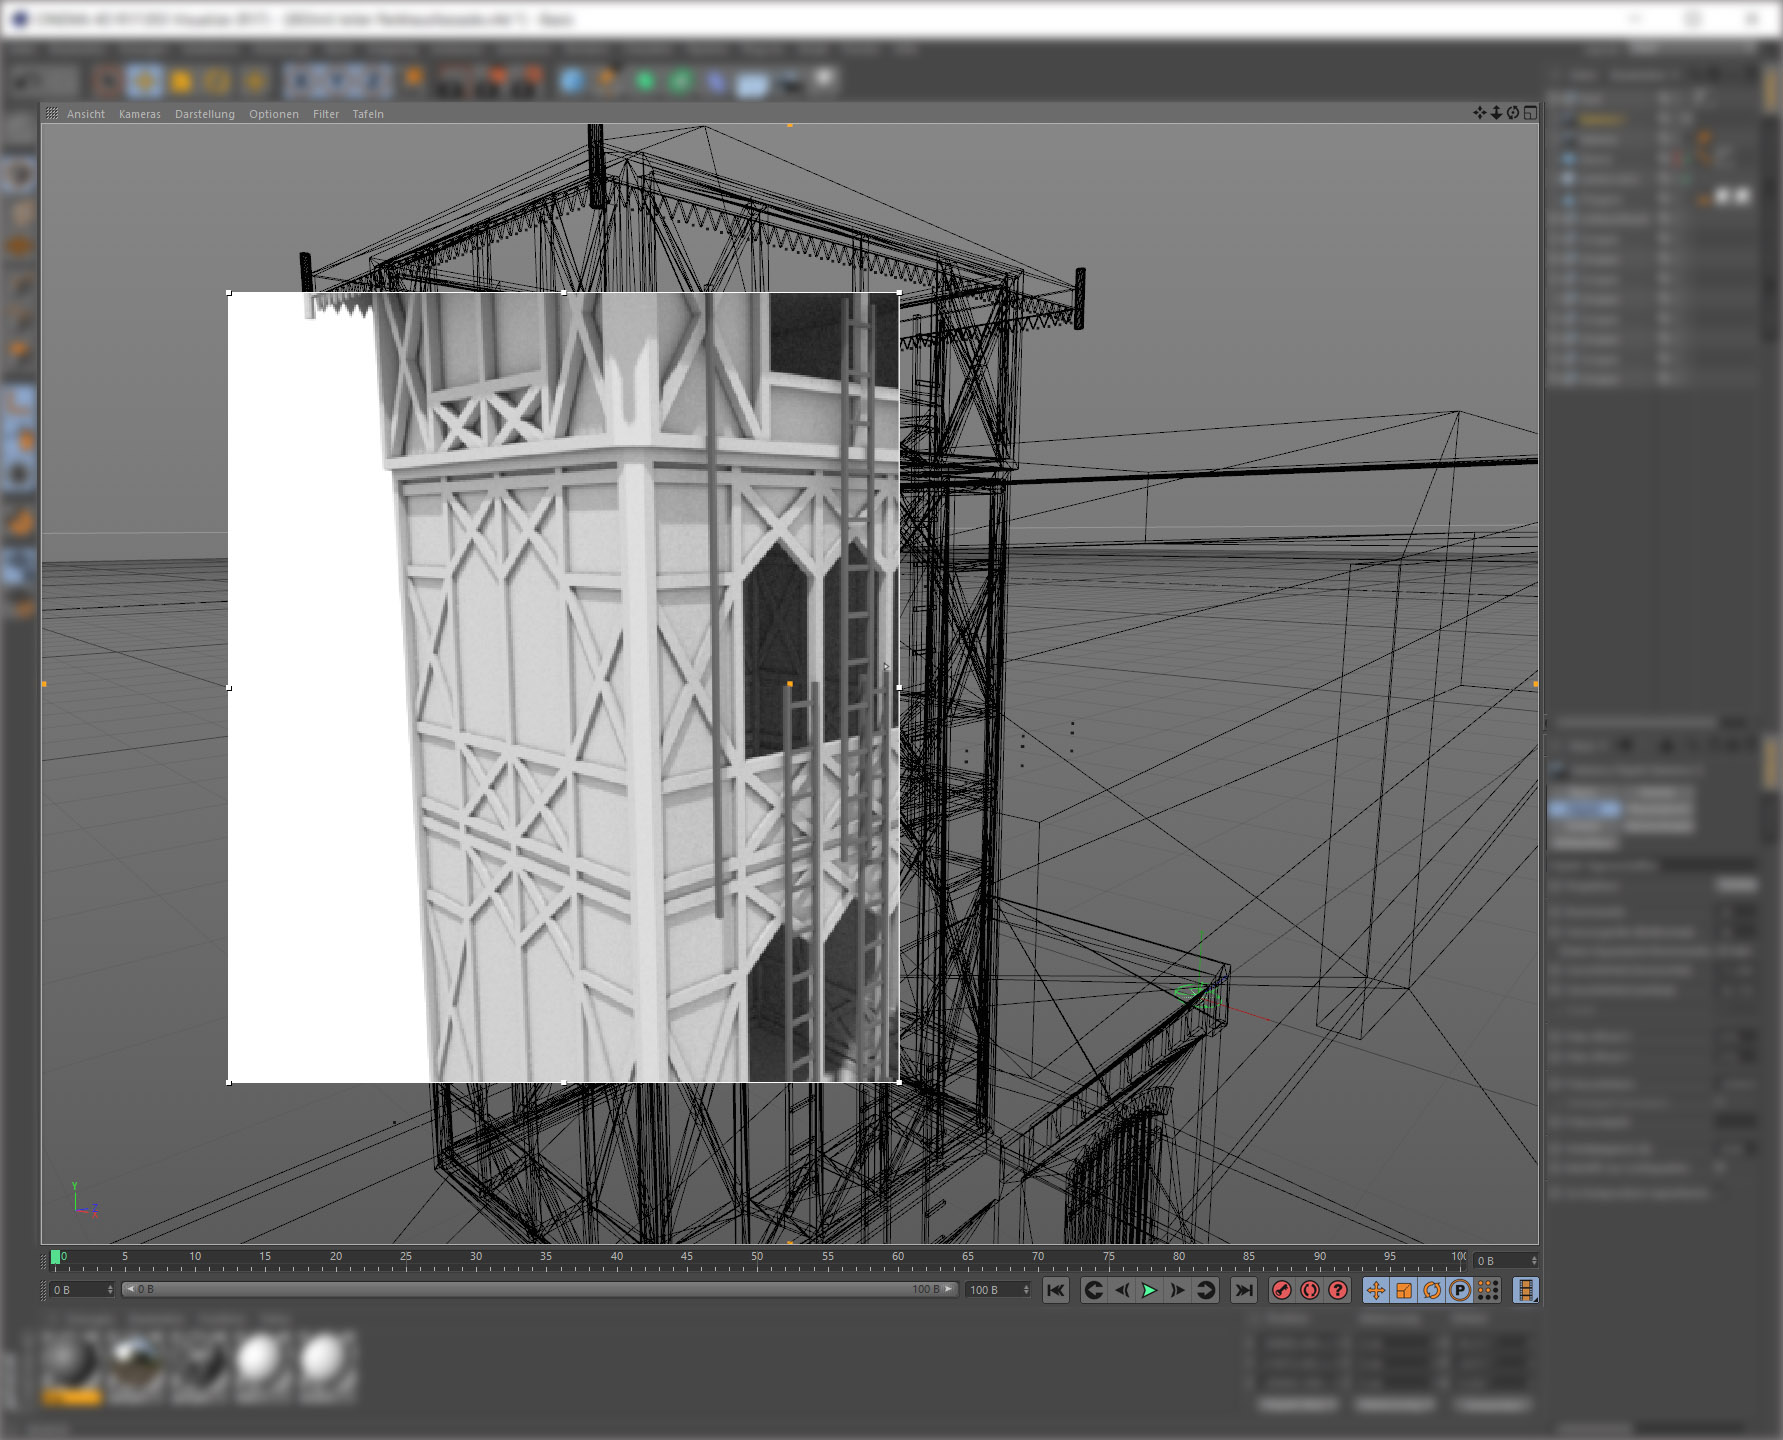 Feuerwehr_Cottbus_Historisch_Wandbild_Fassade_3D_Sketch